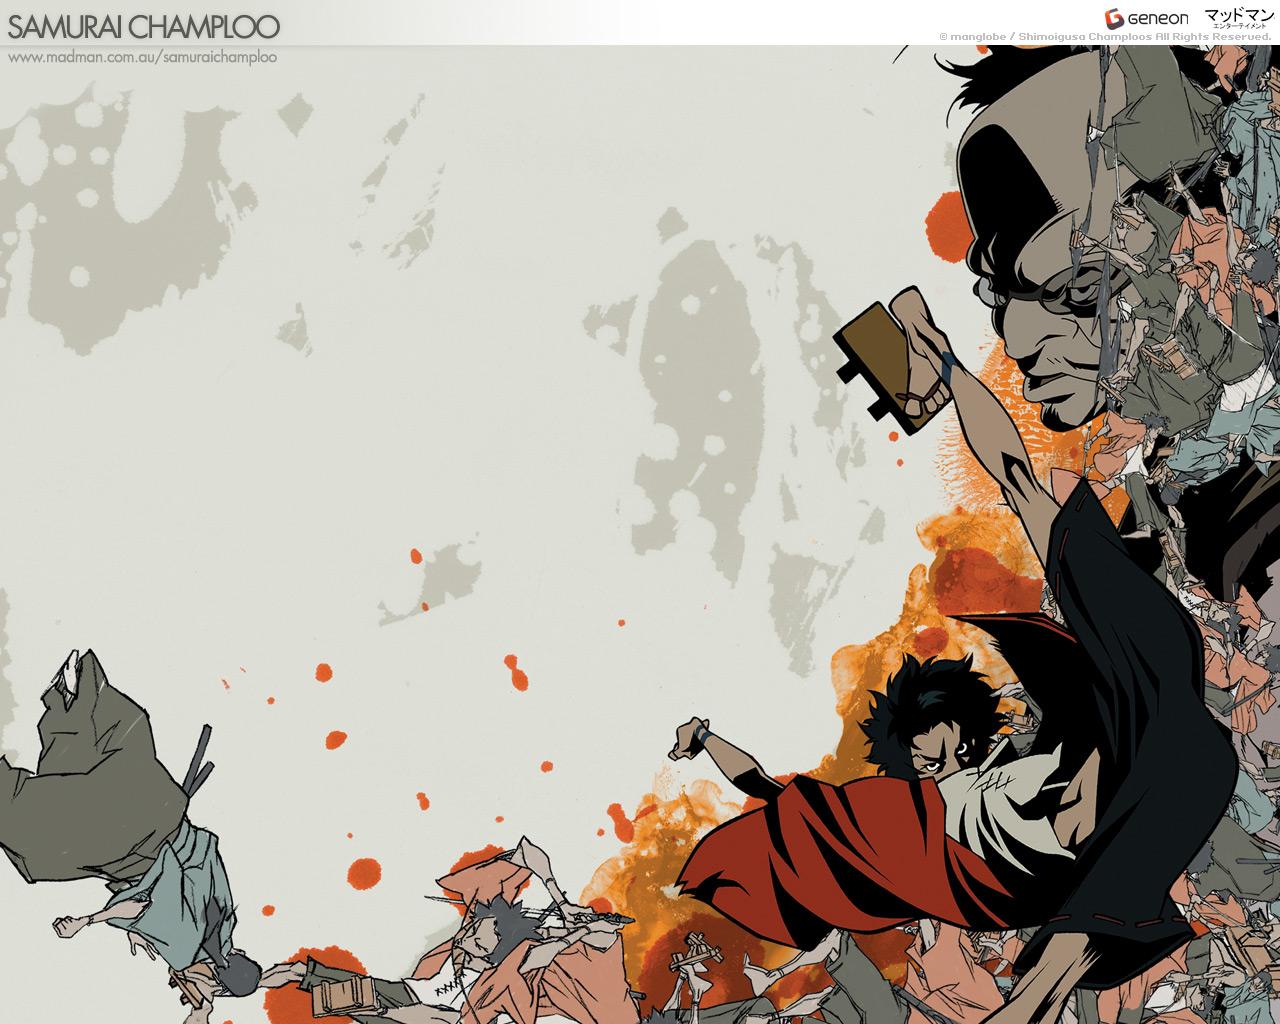 Samurai Champloo Wallpaper 11   1280 X 1024 stmednet 1280x1024